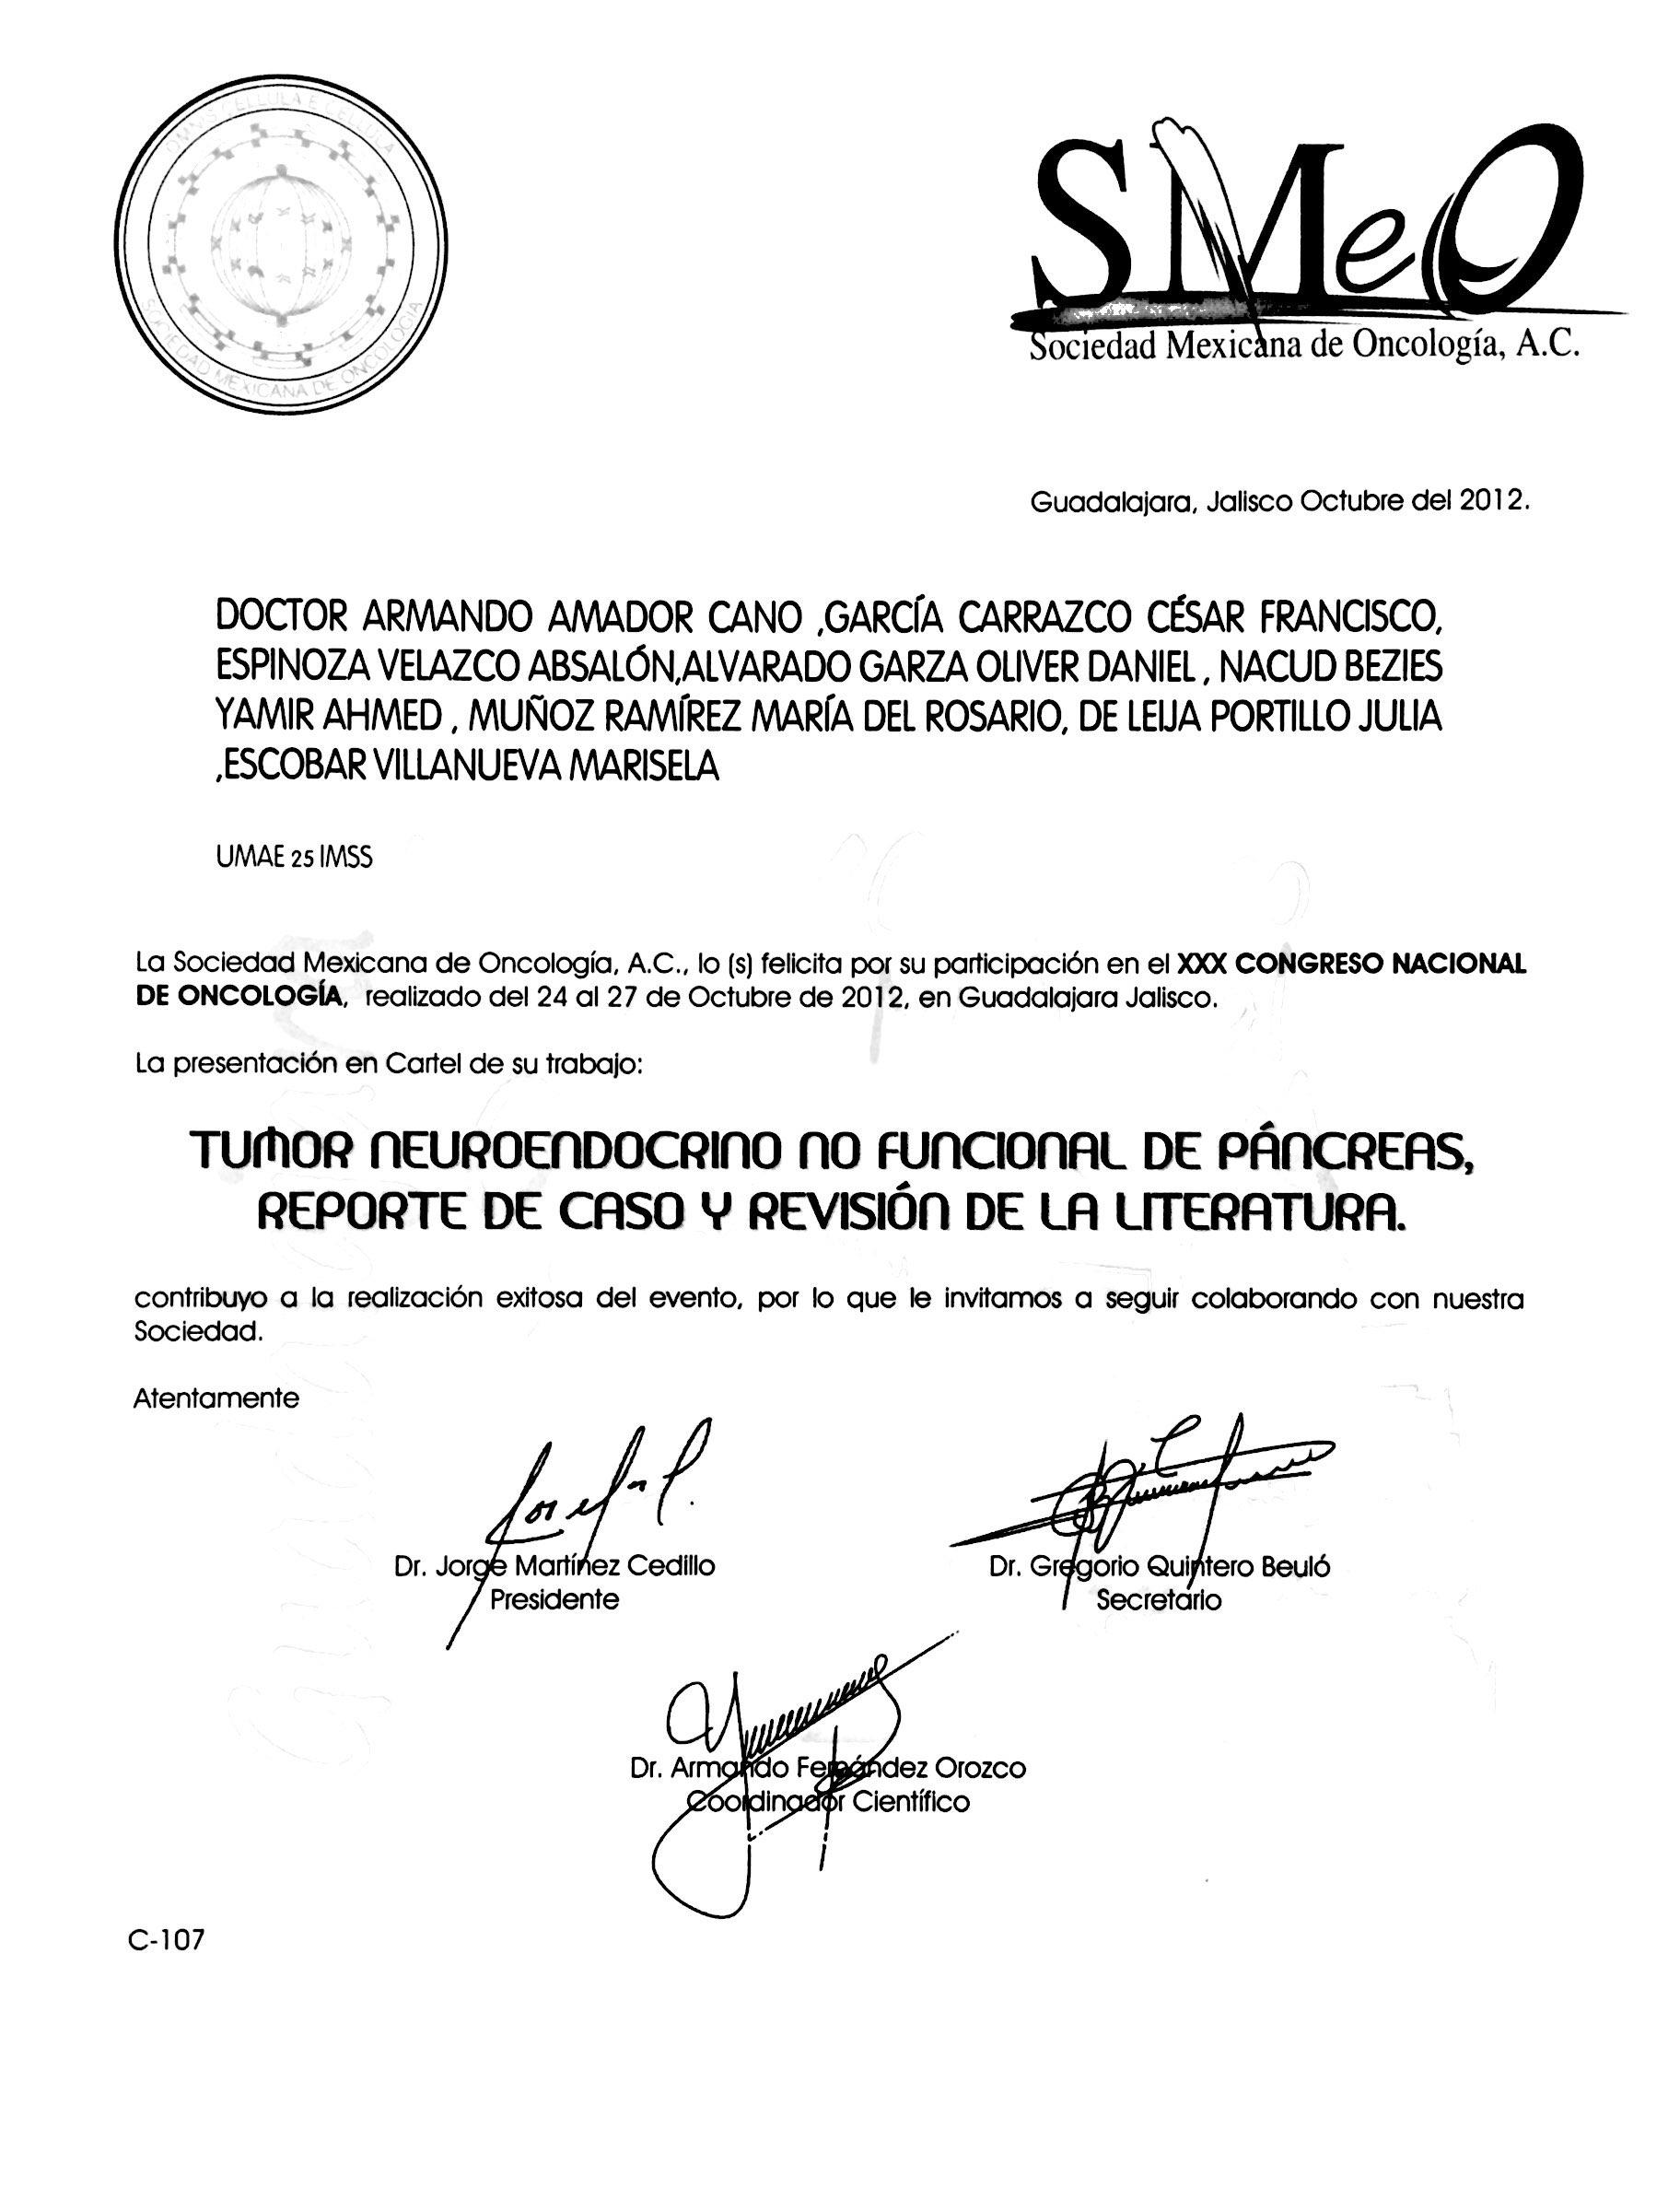 Nuevo doc 2018-02-20 11.21.39_29